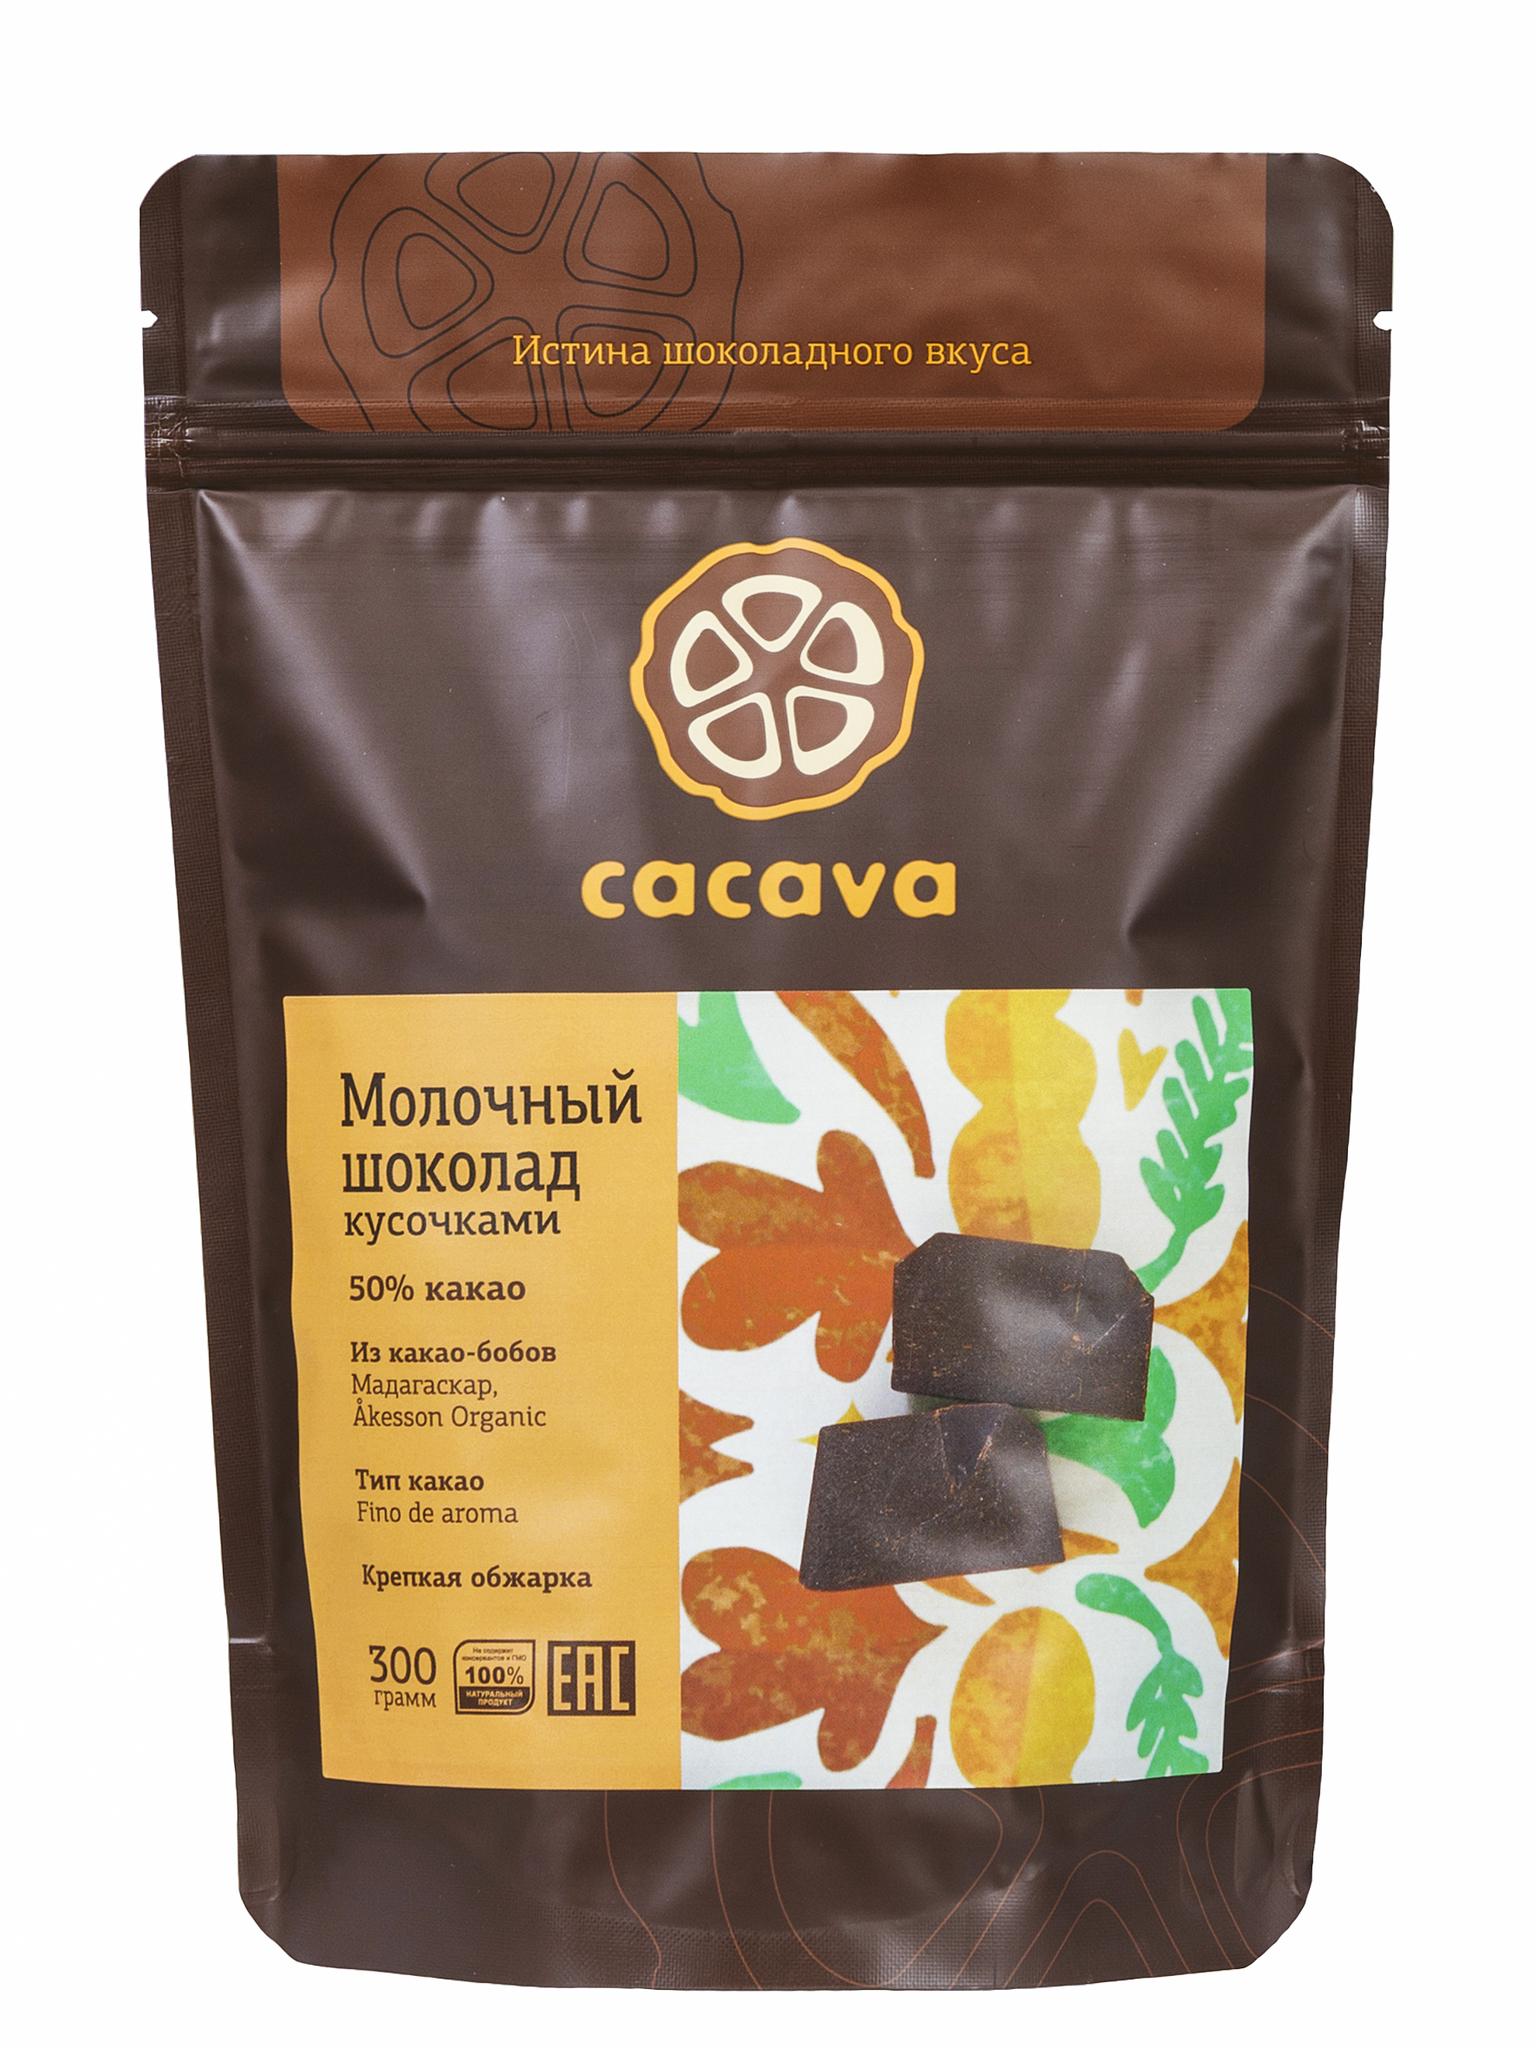 Молочный шоколад 50 % какао (Мадагаскар, Åkesson), упаковка 300 грамм